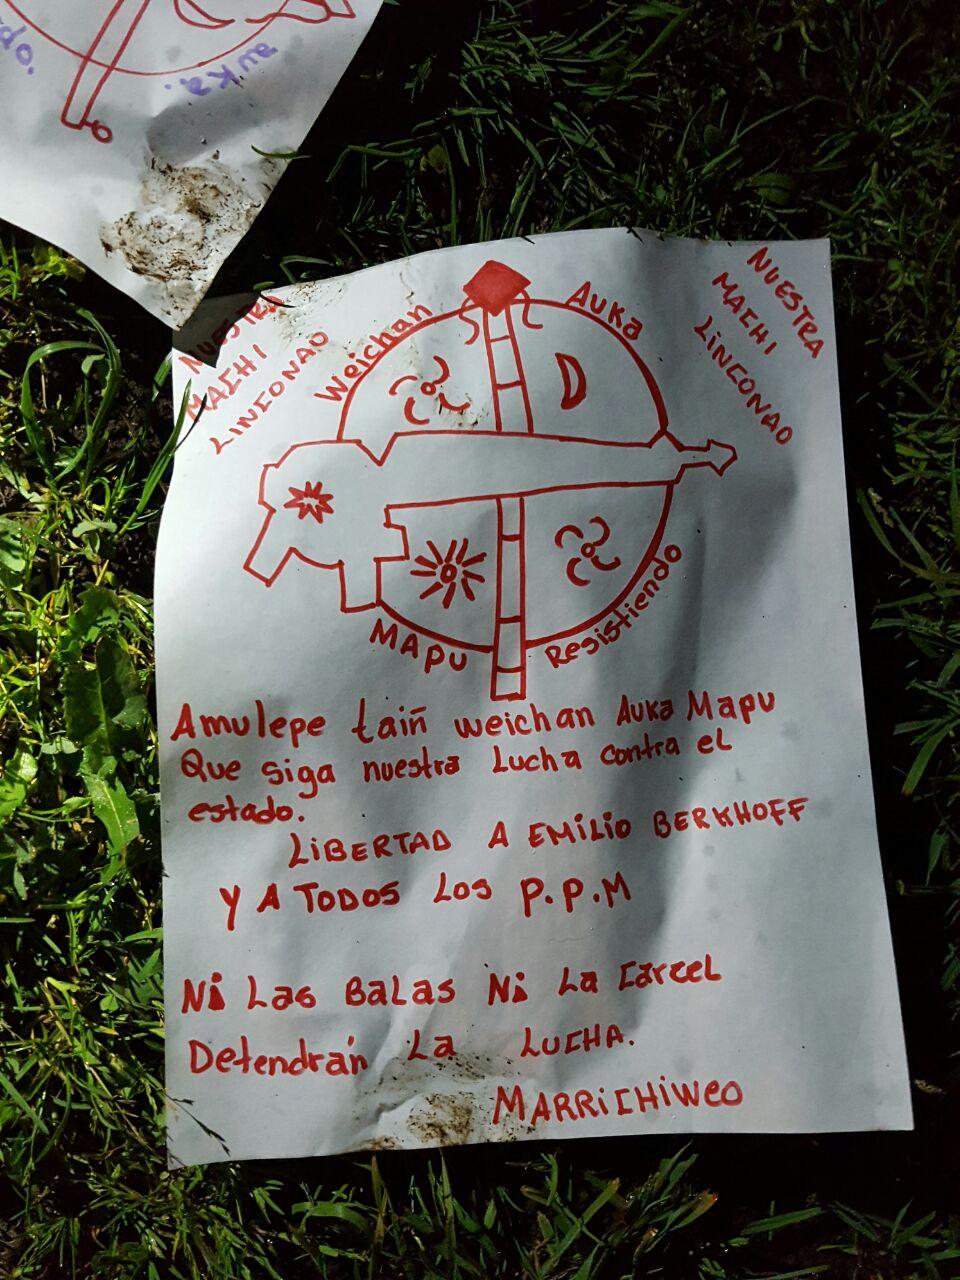 Panfleto encontrado tras intento de incendio en capilla católica de Cañete.